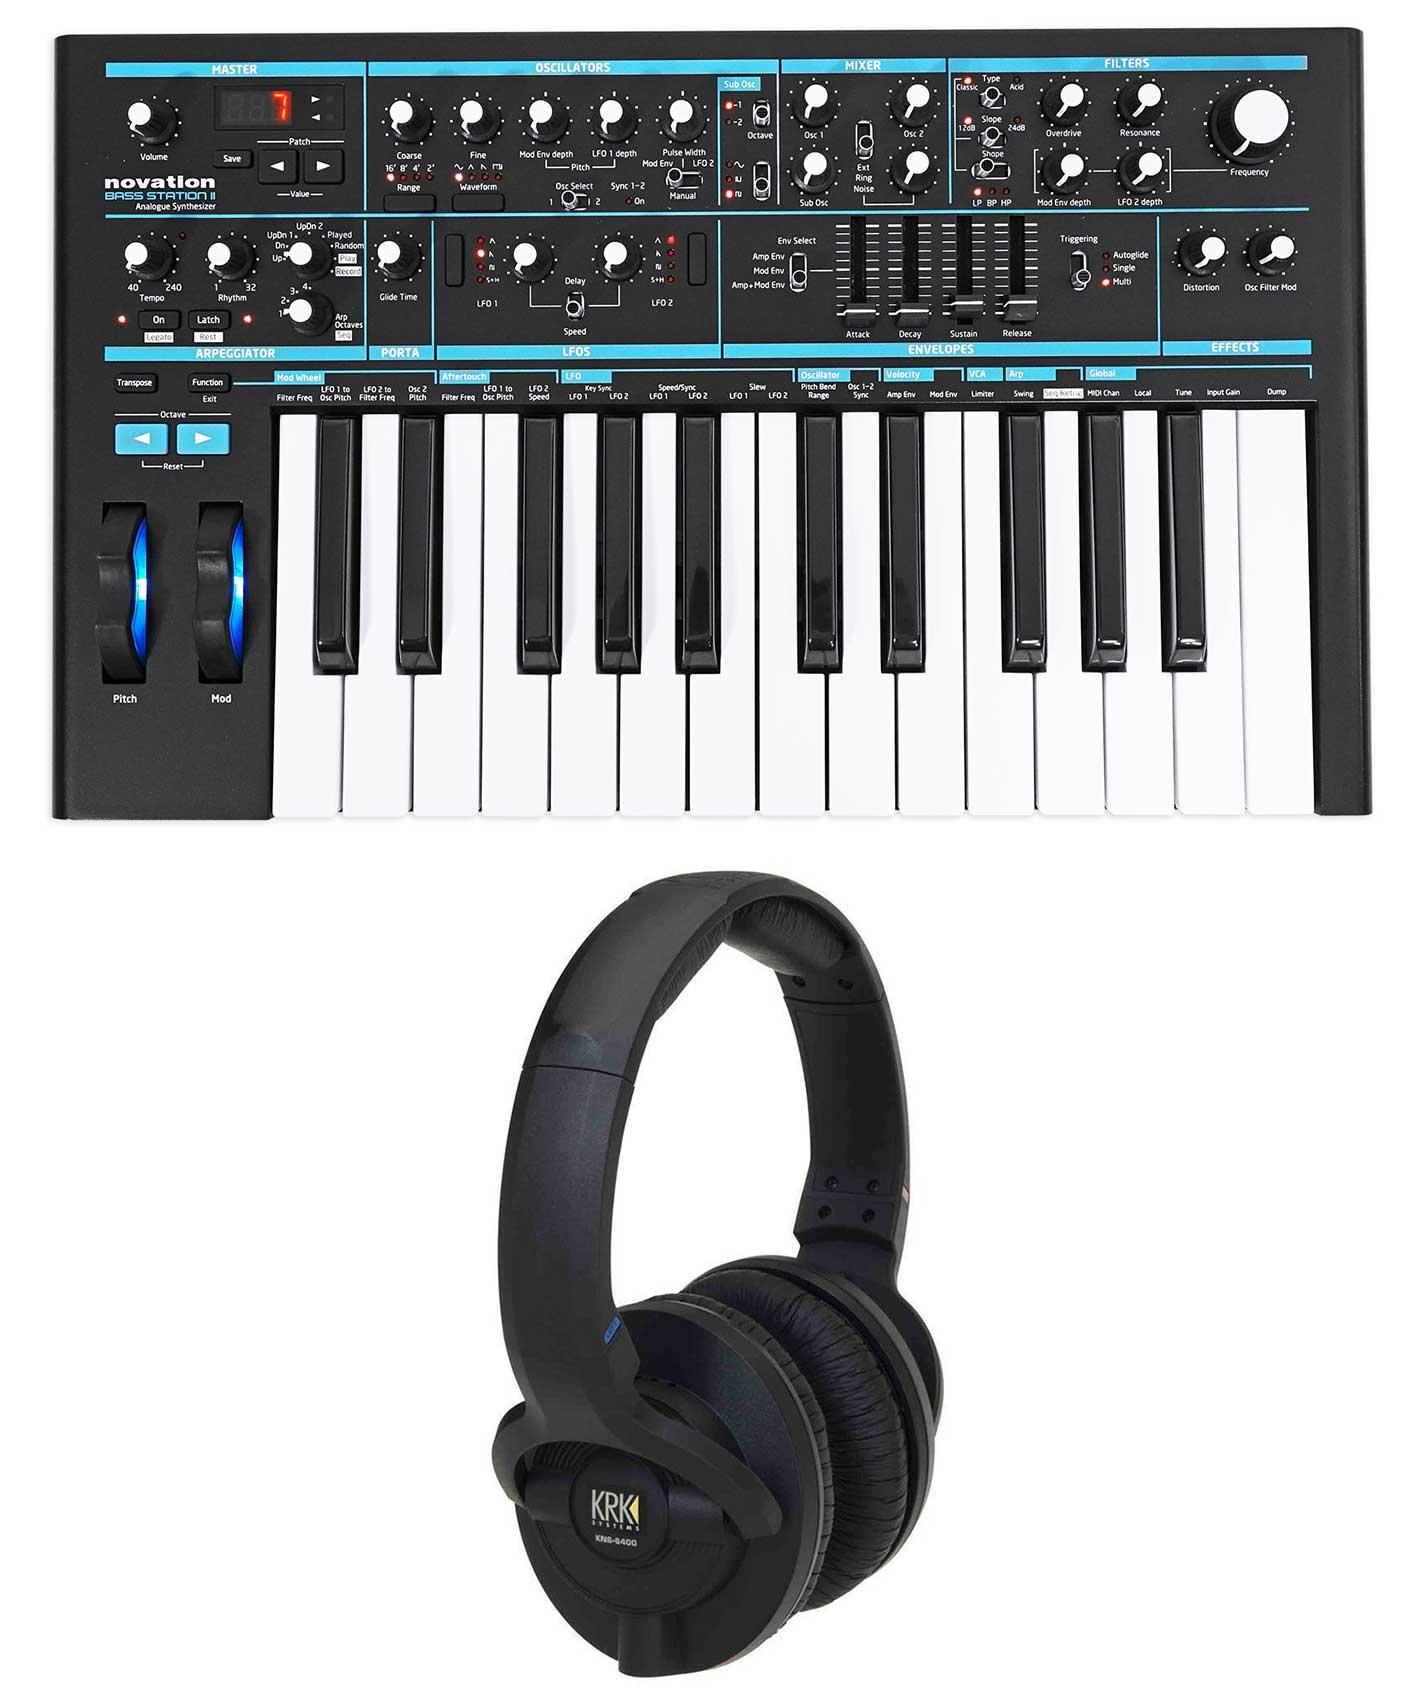 Novation BASS STATION II 25-Key Analog Keyboard USB Synthesizer + KRK Headphones by NOVATION